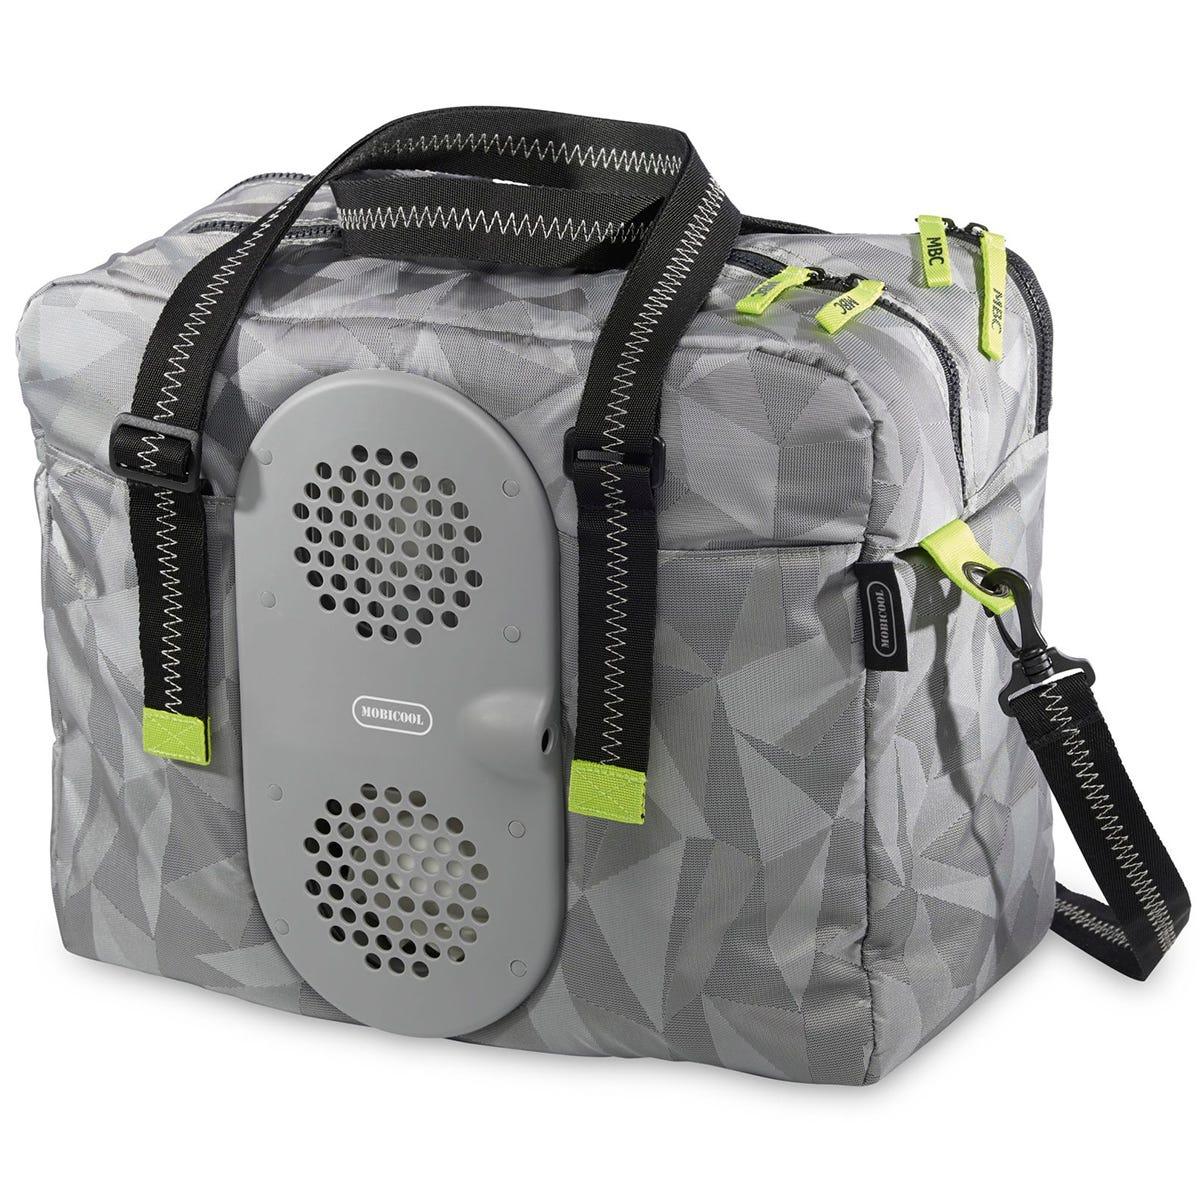 Mobicool Cool Bag DC23 - 23L